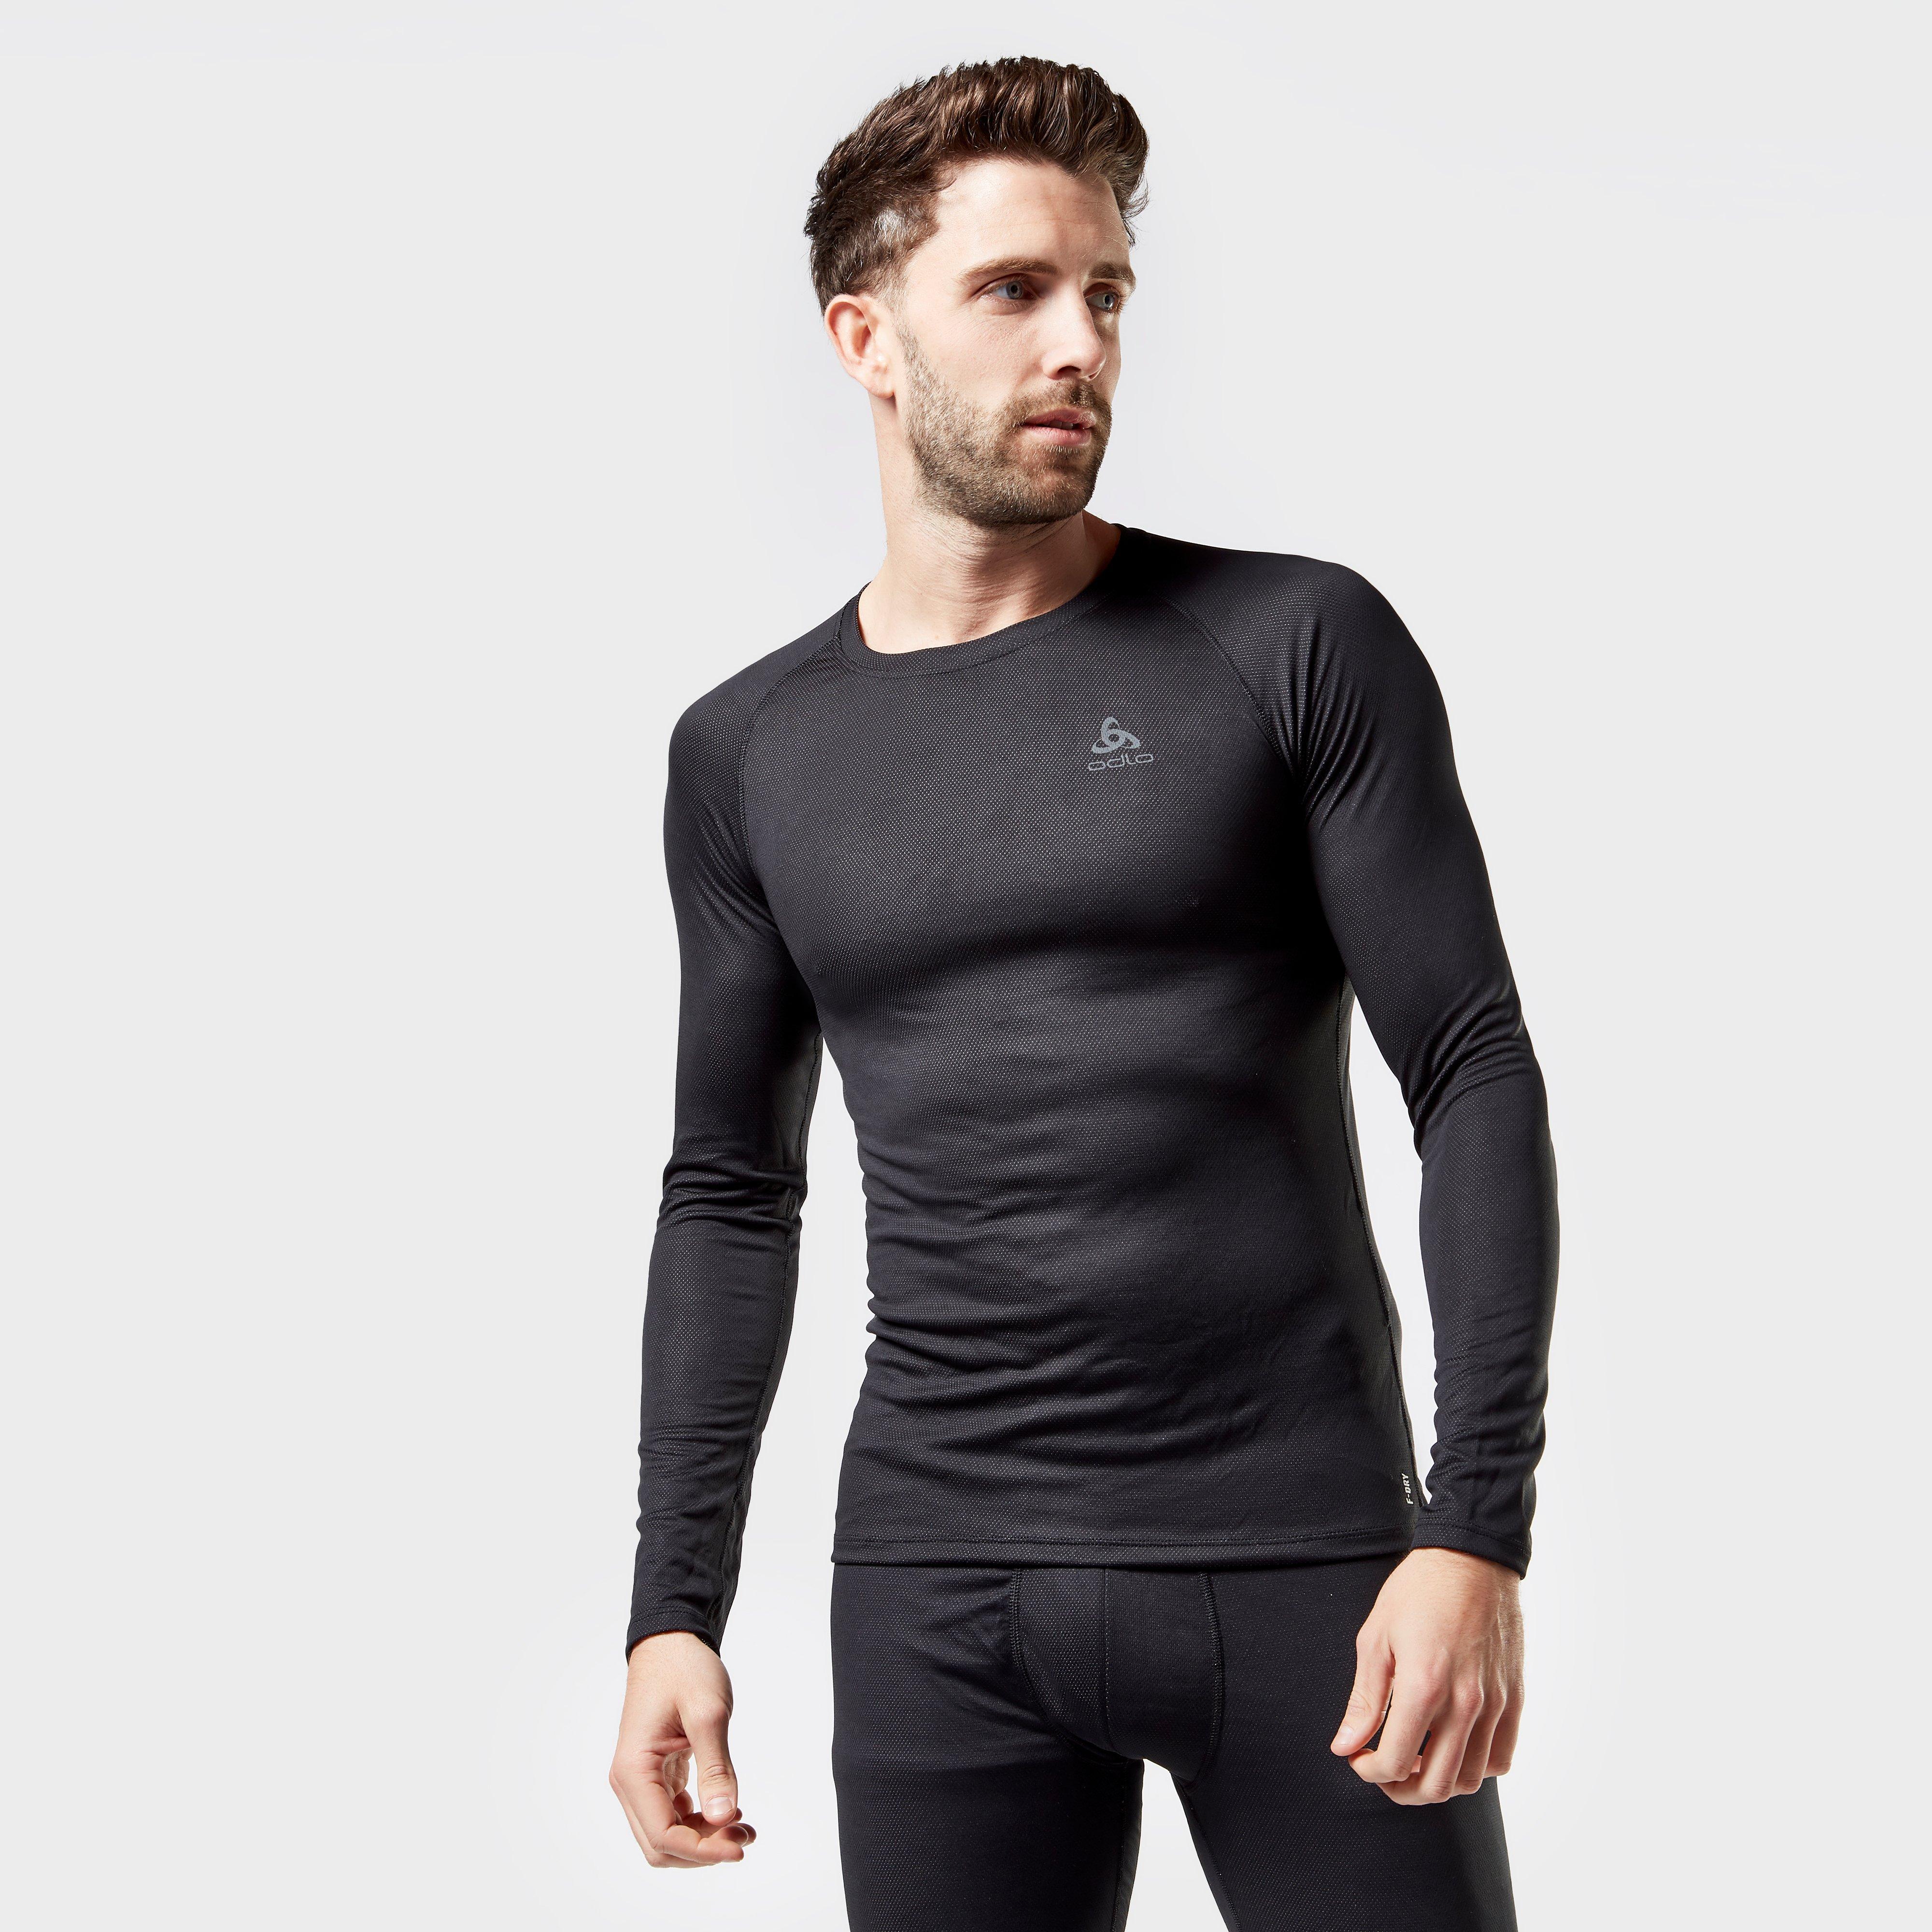 Odlo Odlo Mens Active F-Dry Light Long Sleeve Base Layer Top - Black, Black